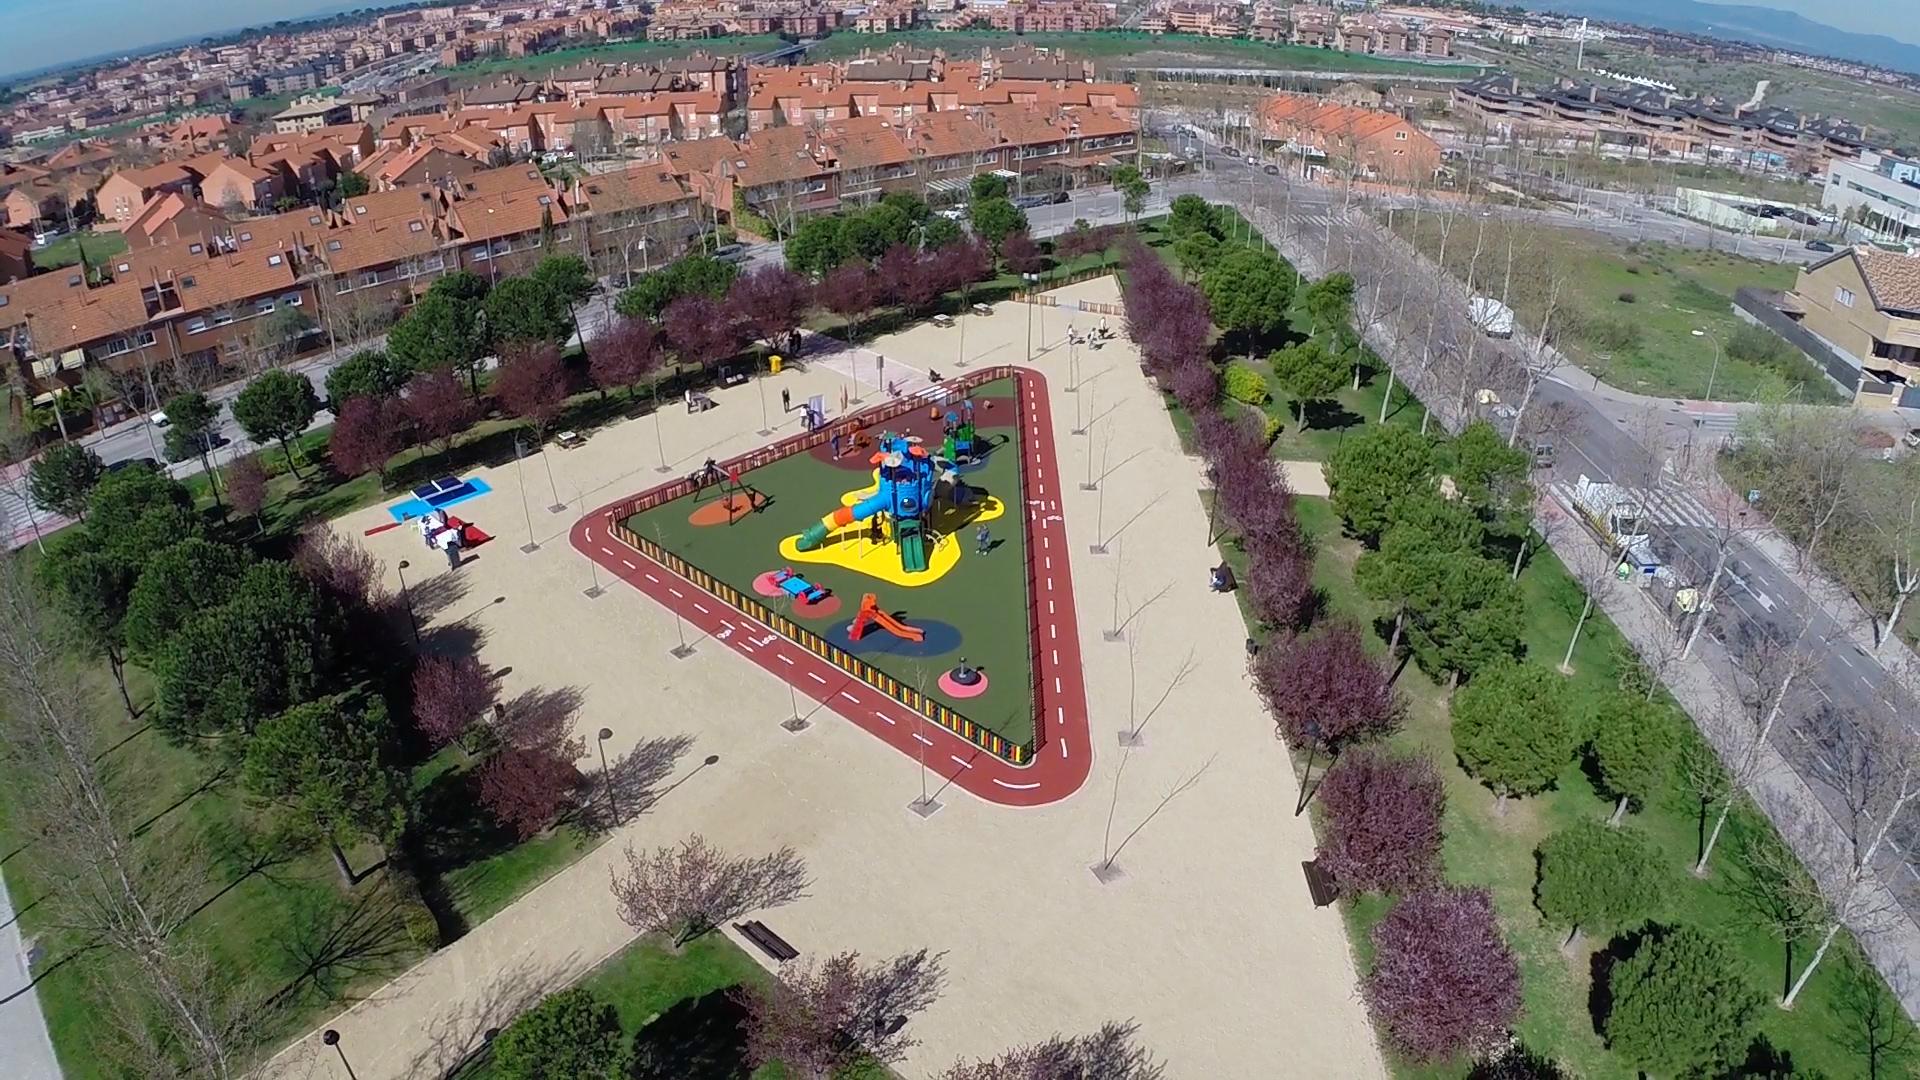 Parques m s accesibles para ni os con problemas de for Parques de barcelona para ninos